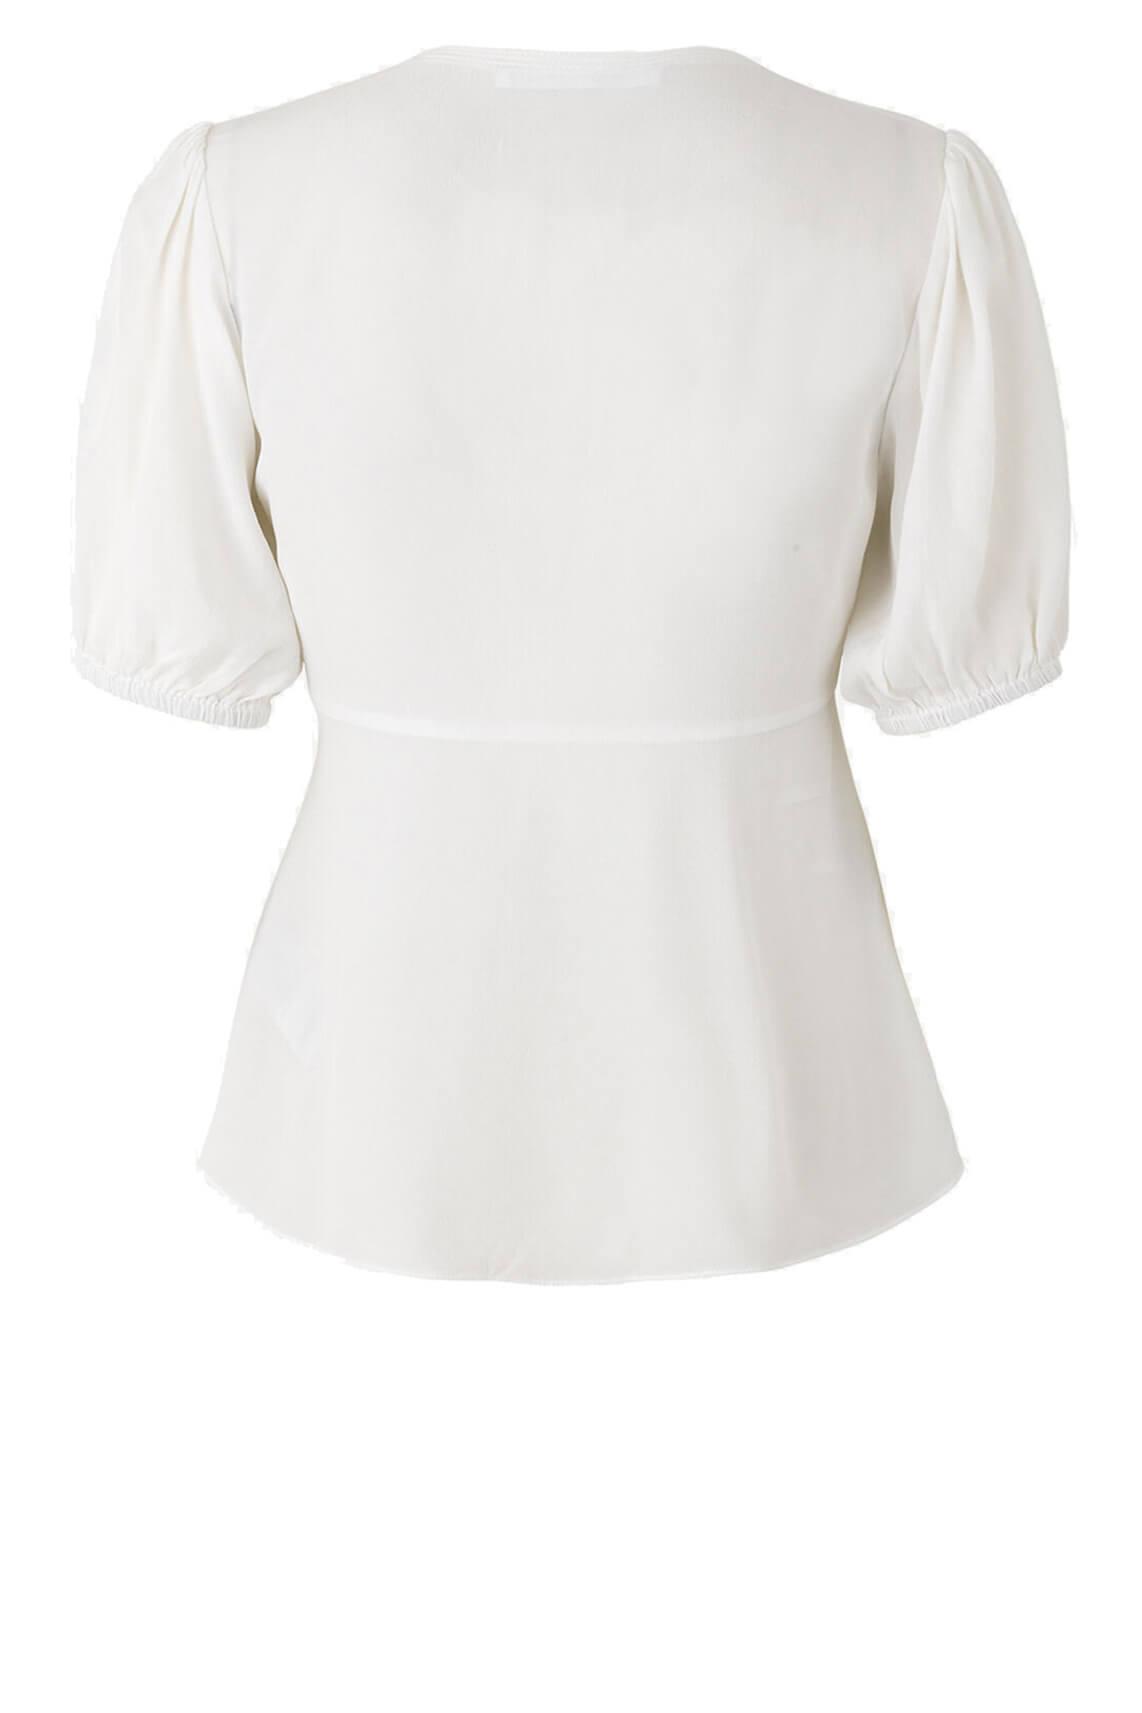 Samsoe Samsoe Dames Petunia blouse wit